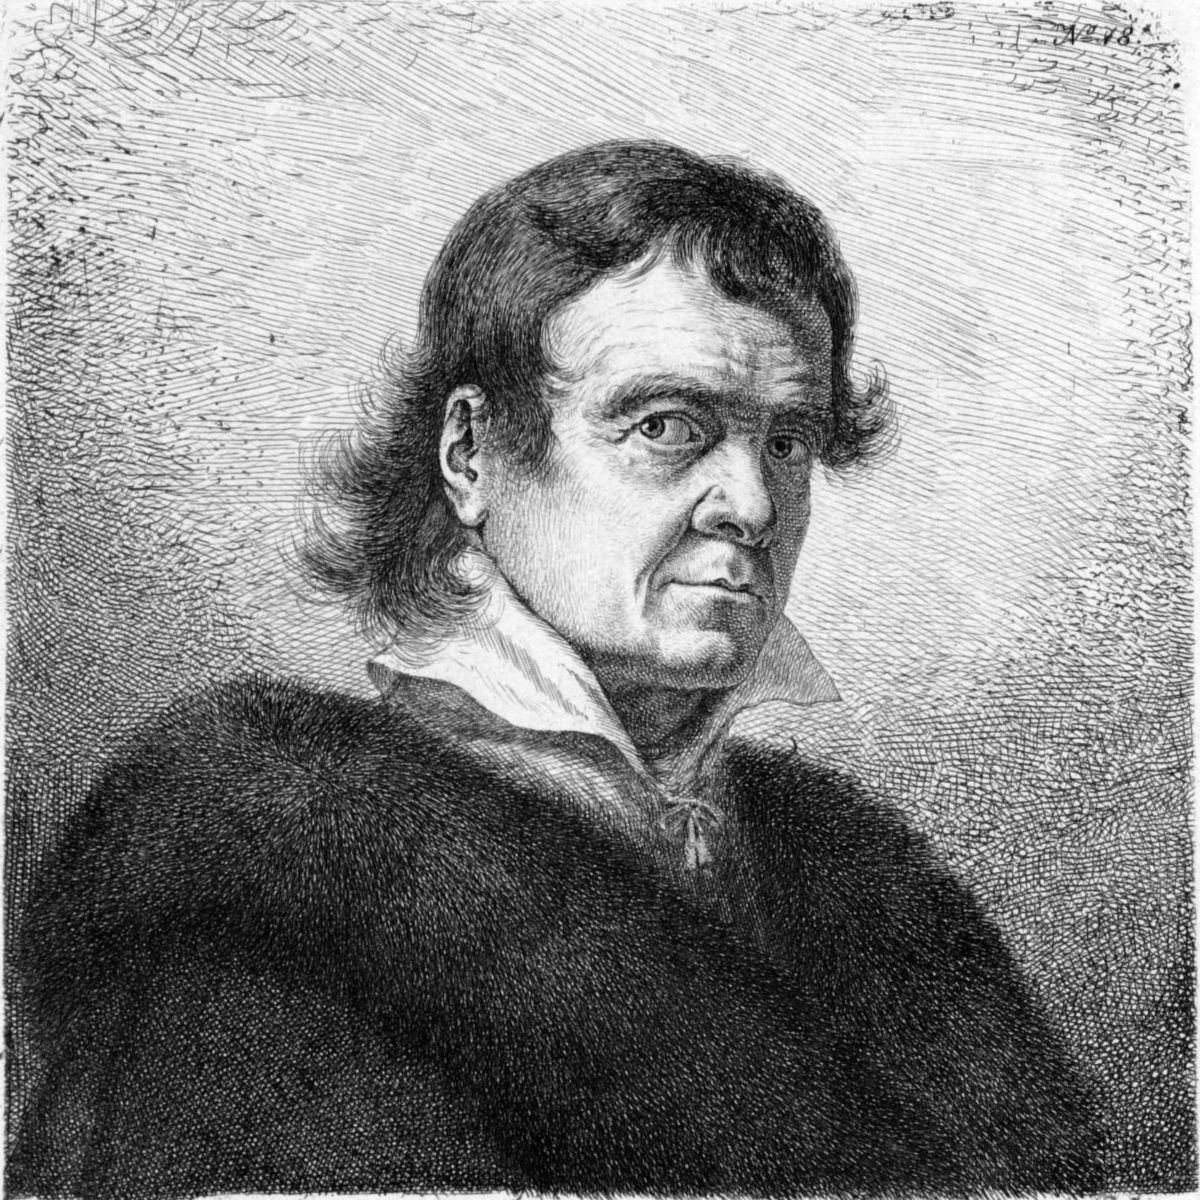 Maler Müller - Wikipedia